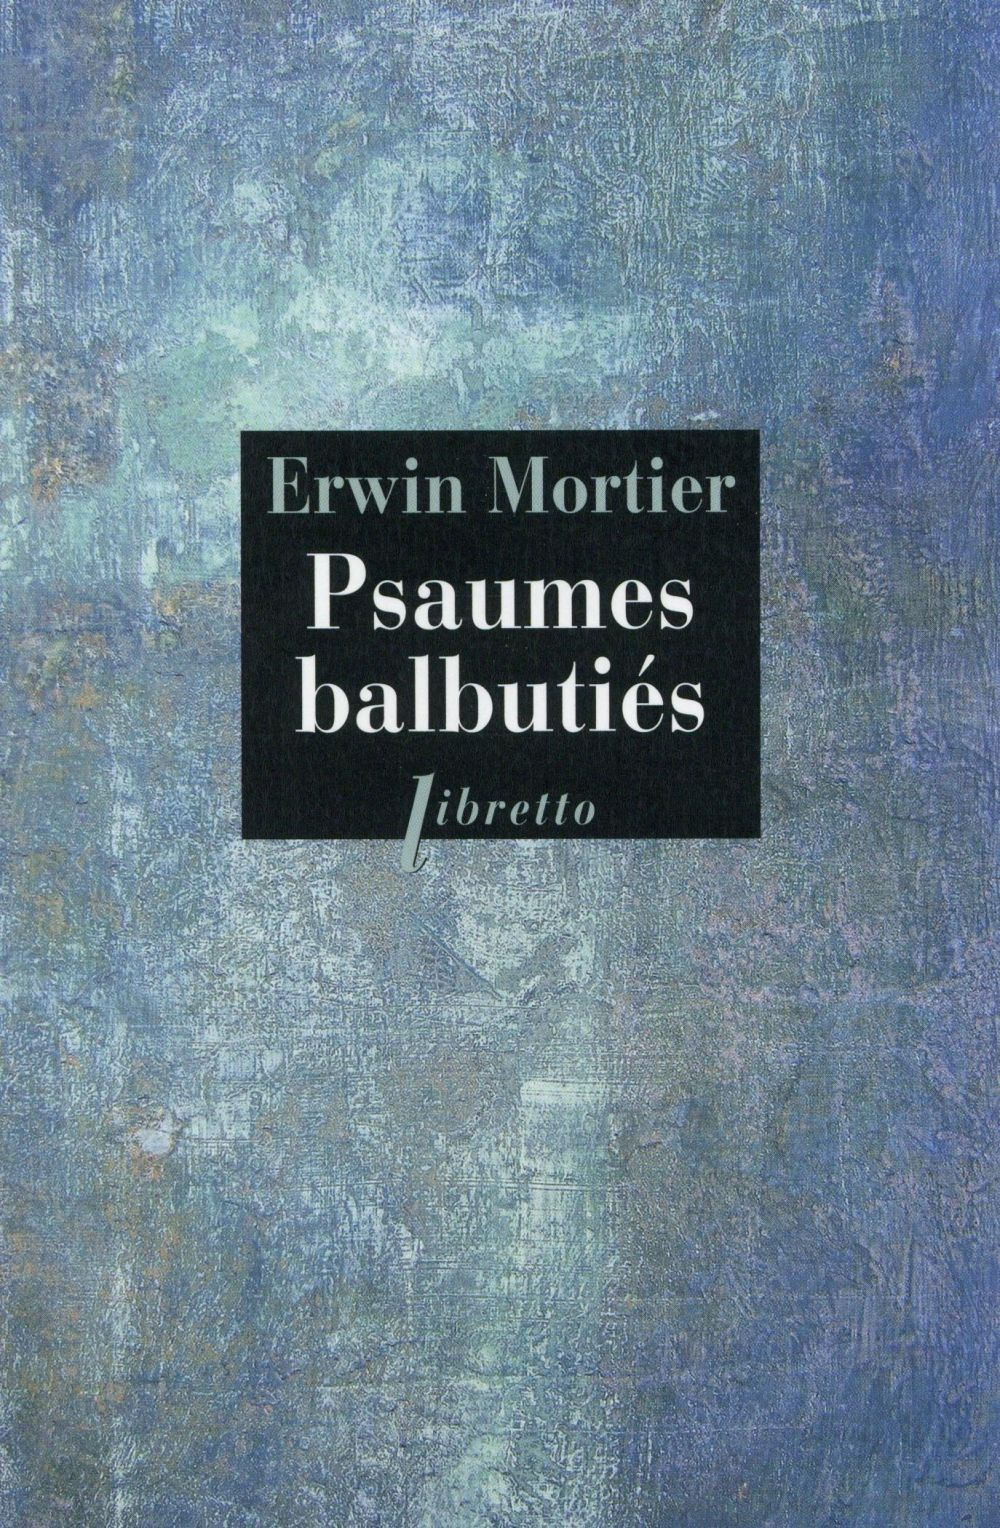 PSAUMES BALBUTIES